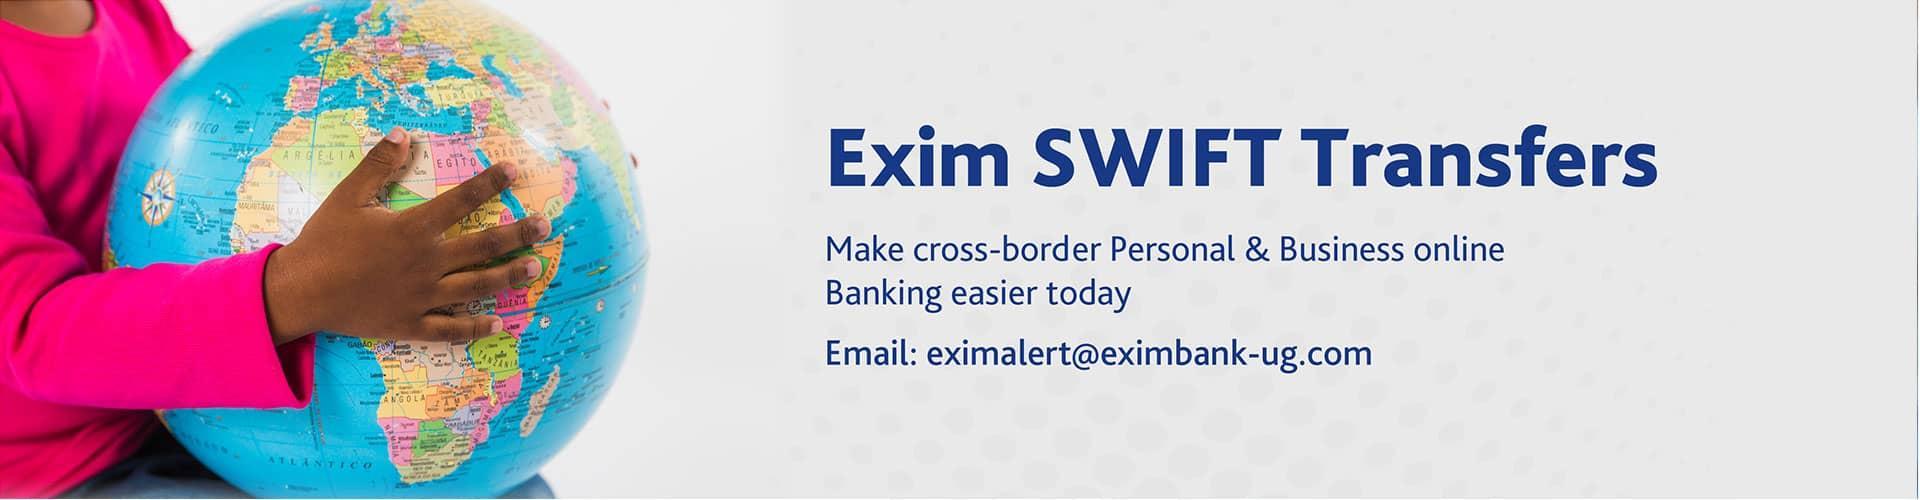 Exim Bank Swift Transfers